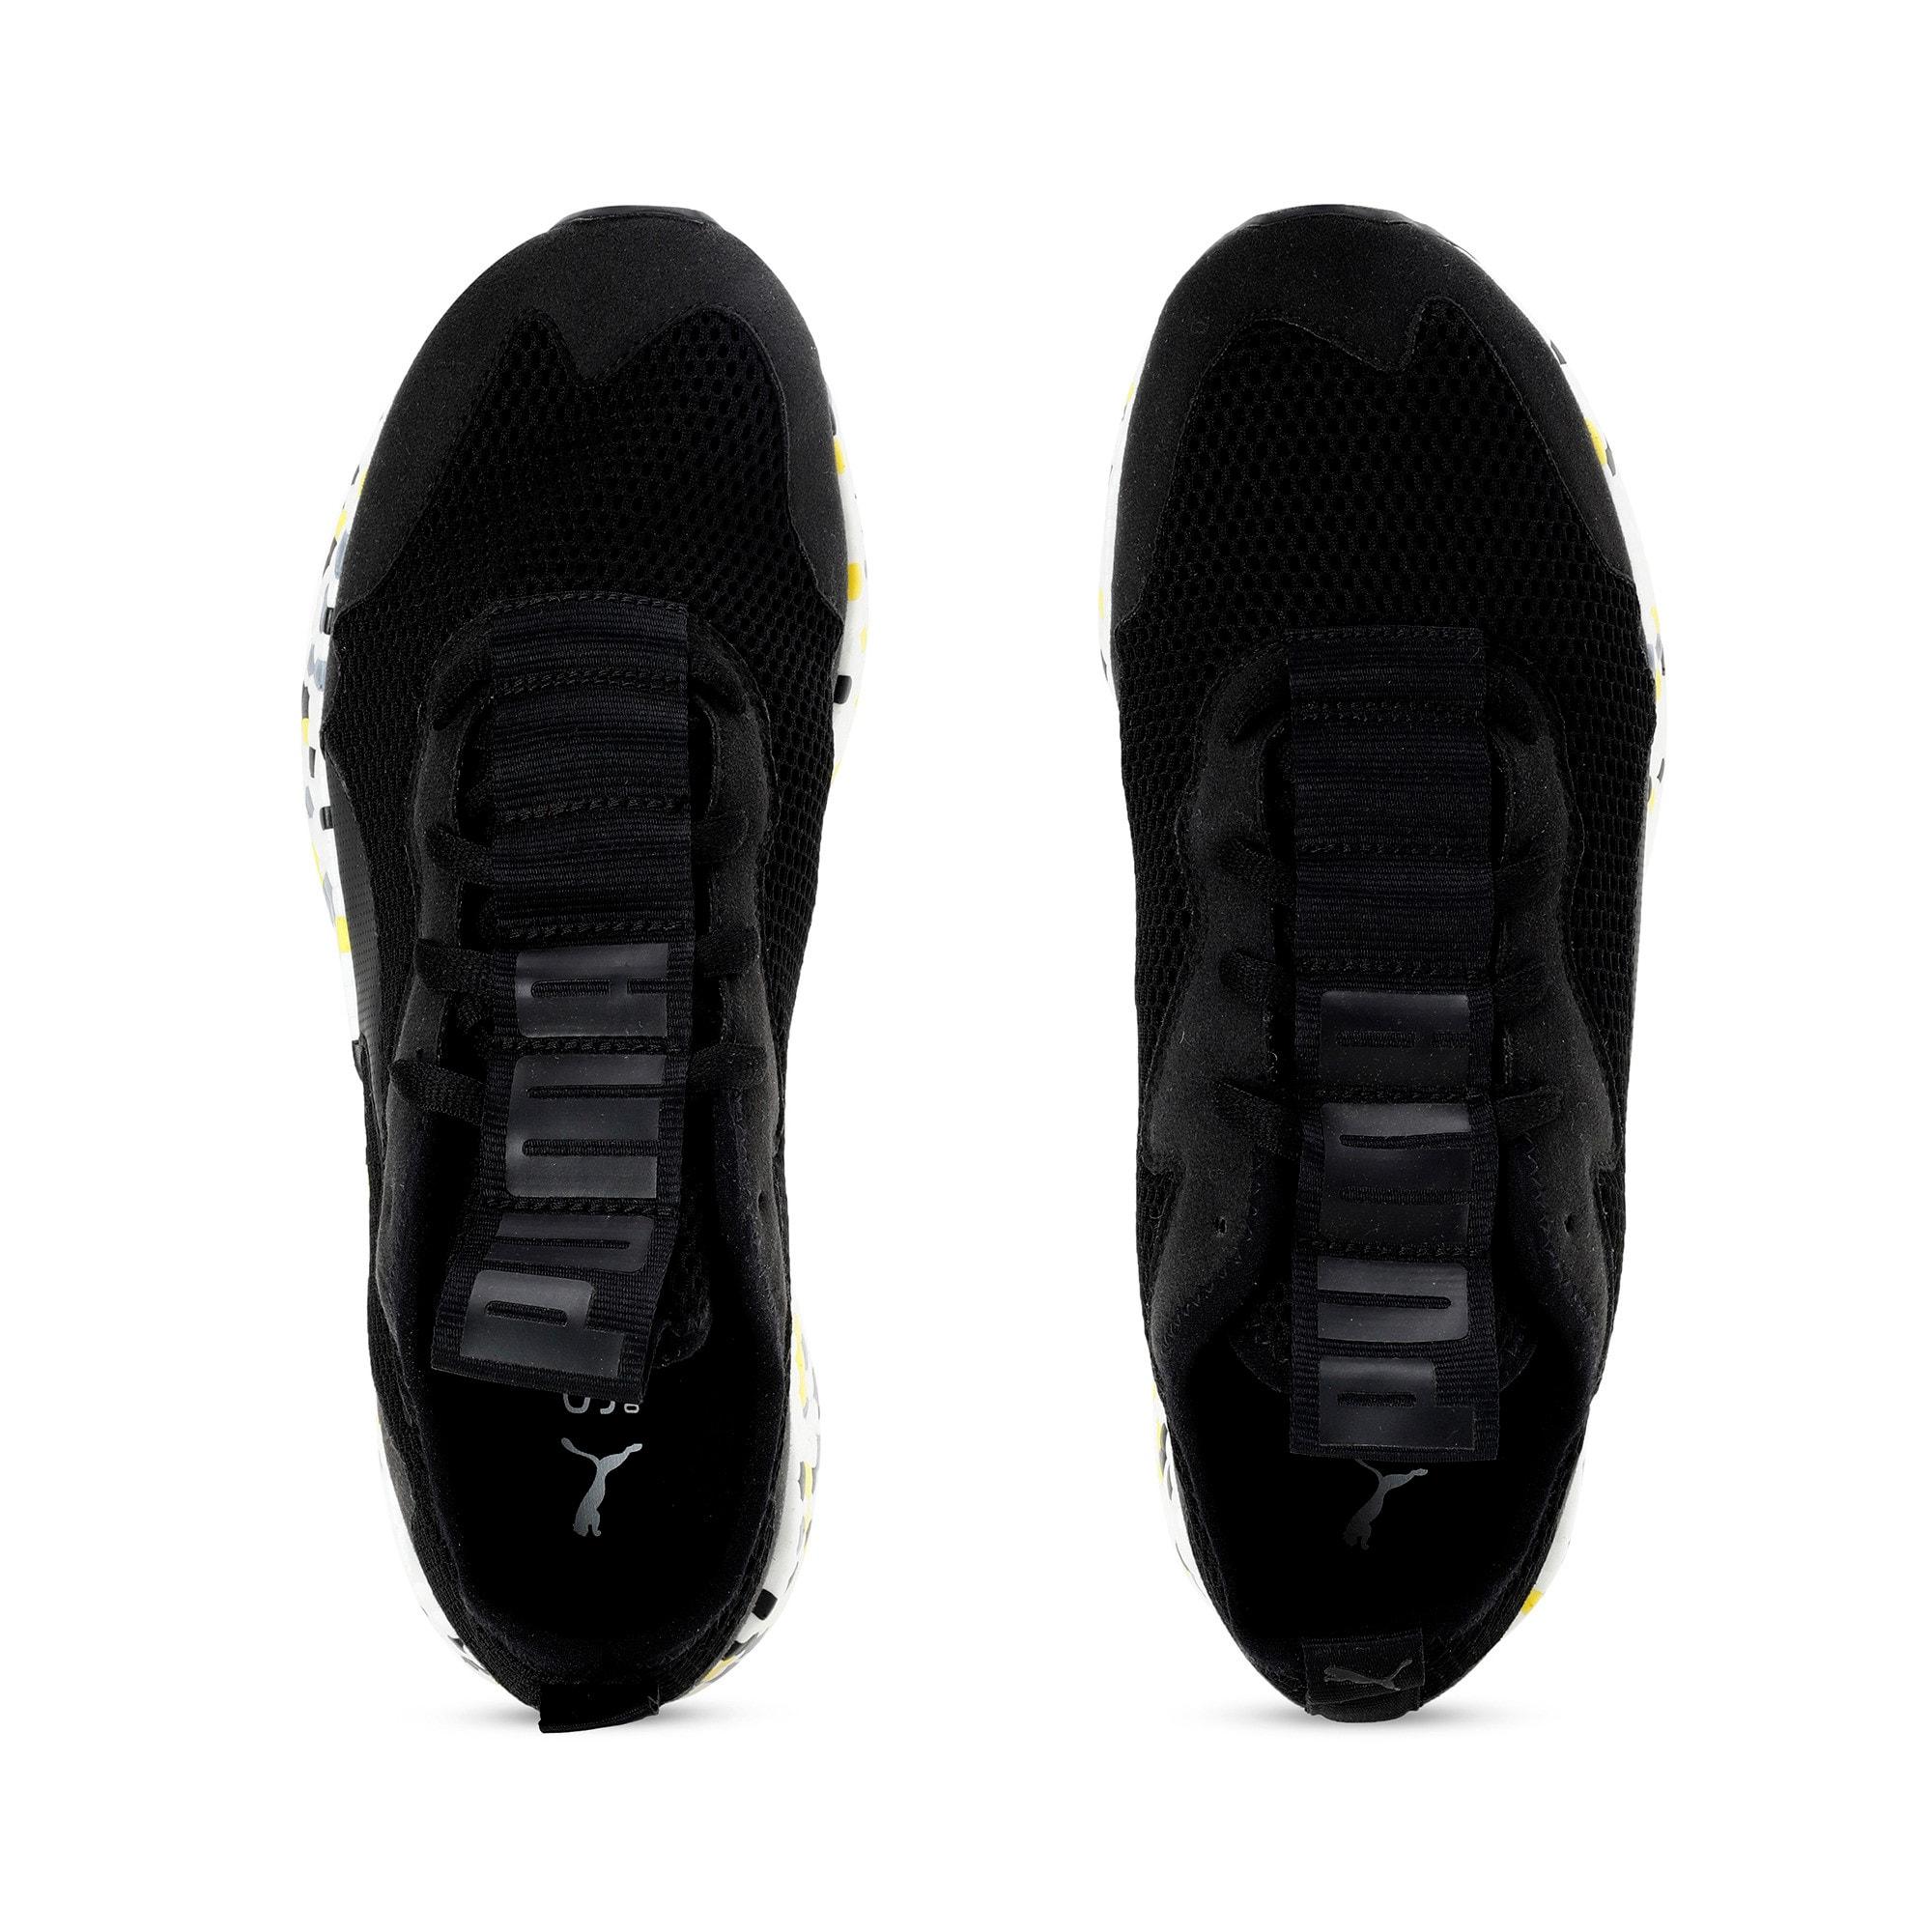 Thumbnail 8 of NRGY Neko Skim Men's Running Shoes, Puma Black-Yellow Alert, medium-IND